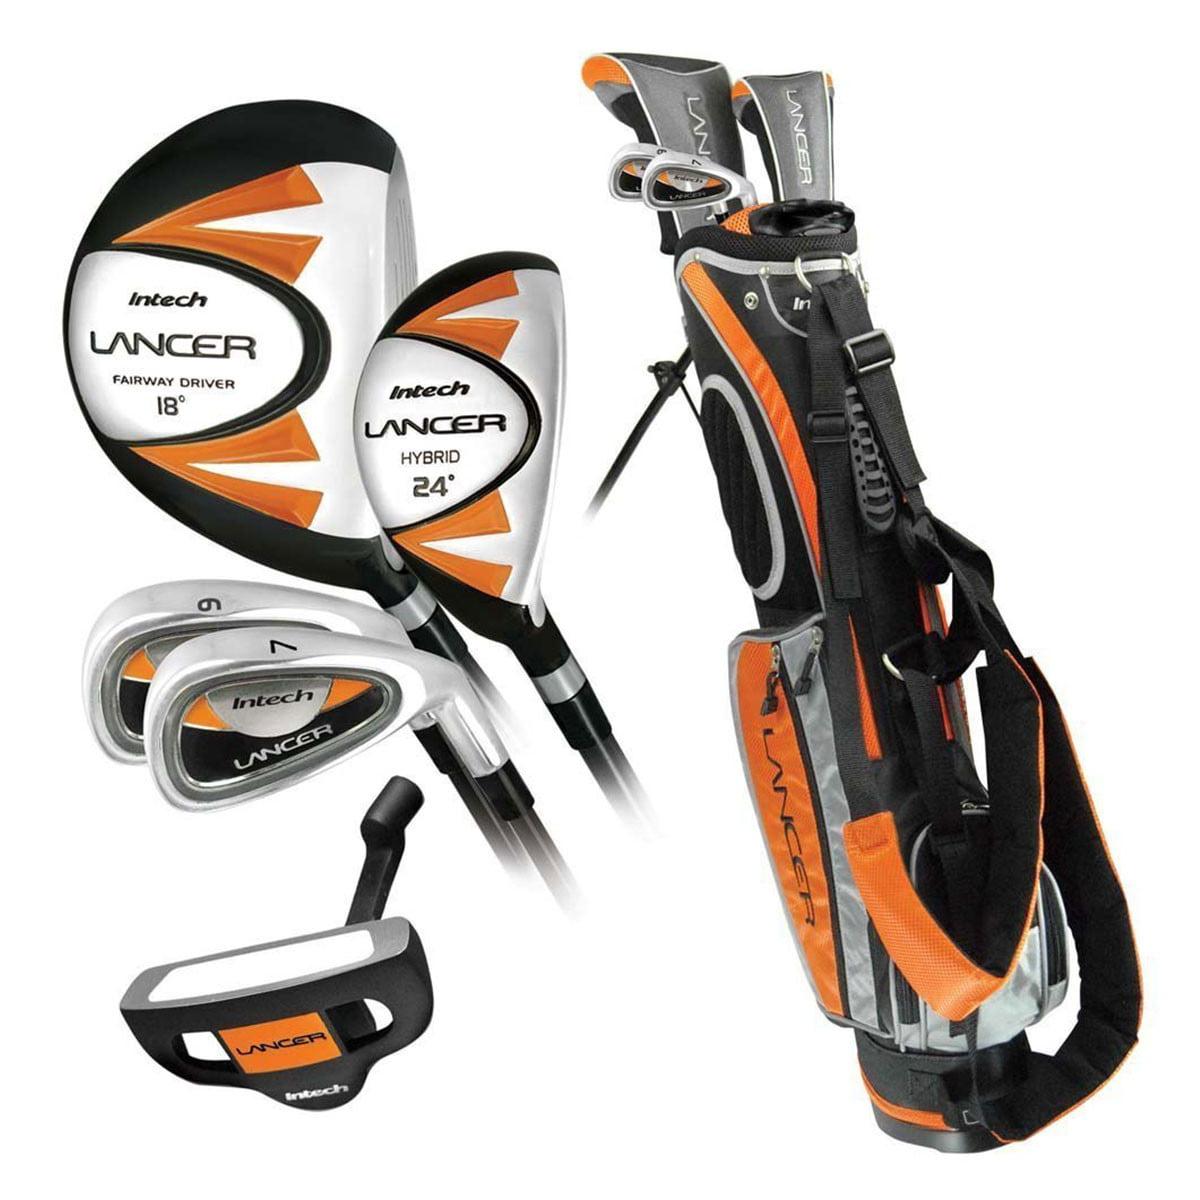 Intech Lancer Junior Golf Club Set Rh Orange Ages 8 12 Walmart Com Walmart Com